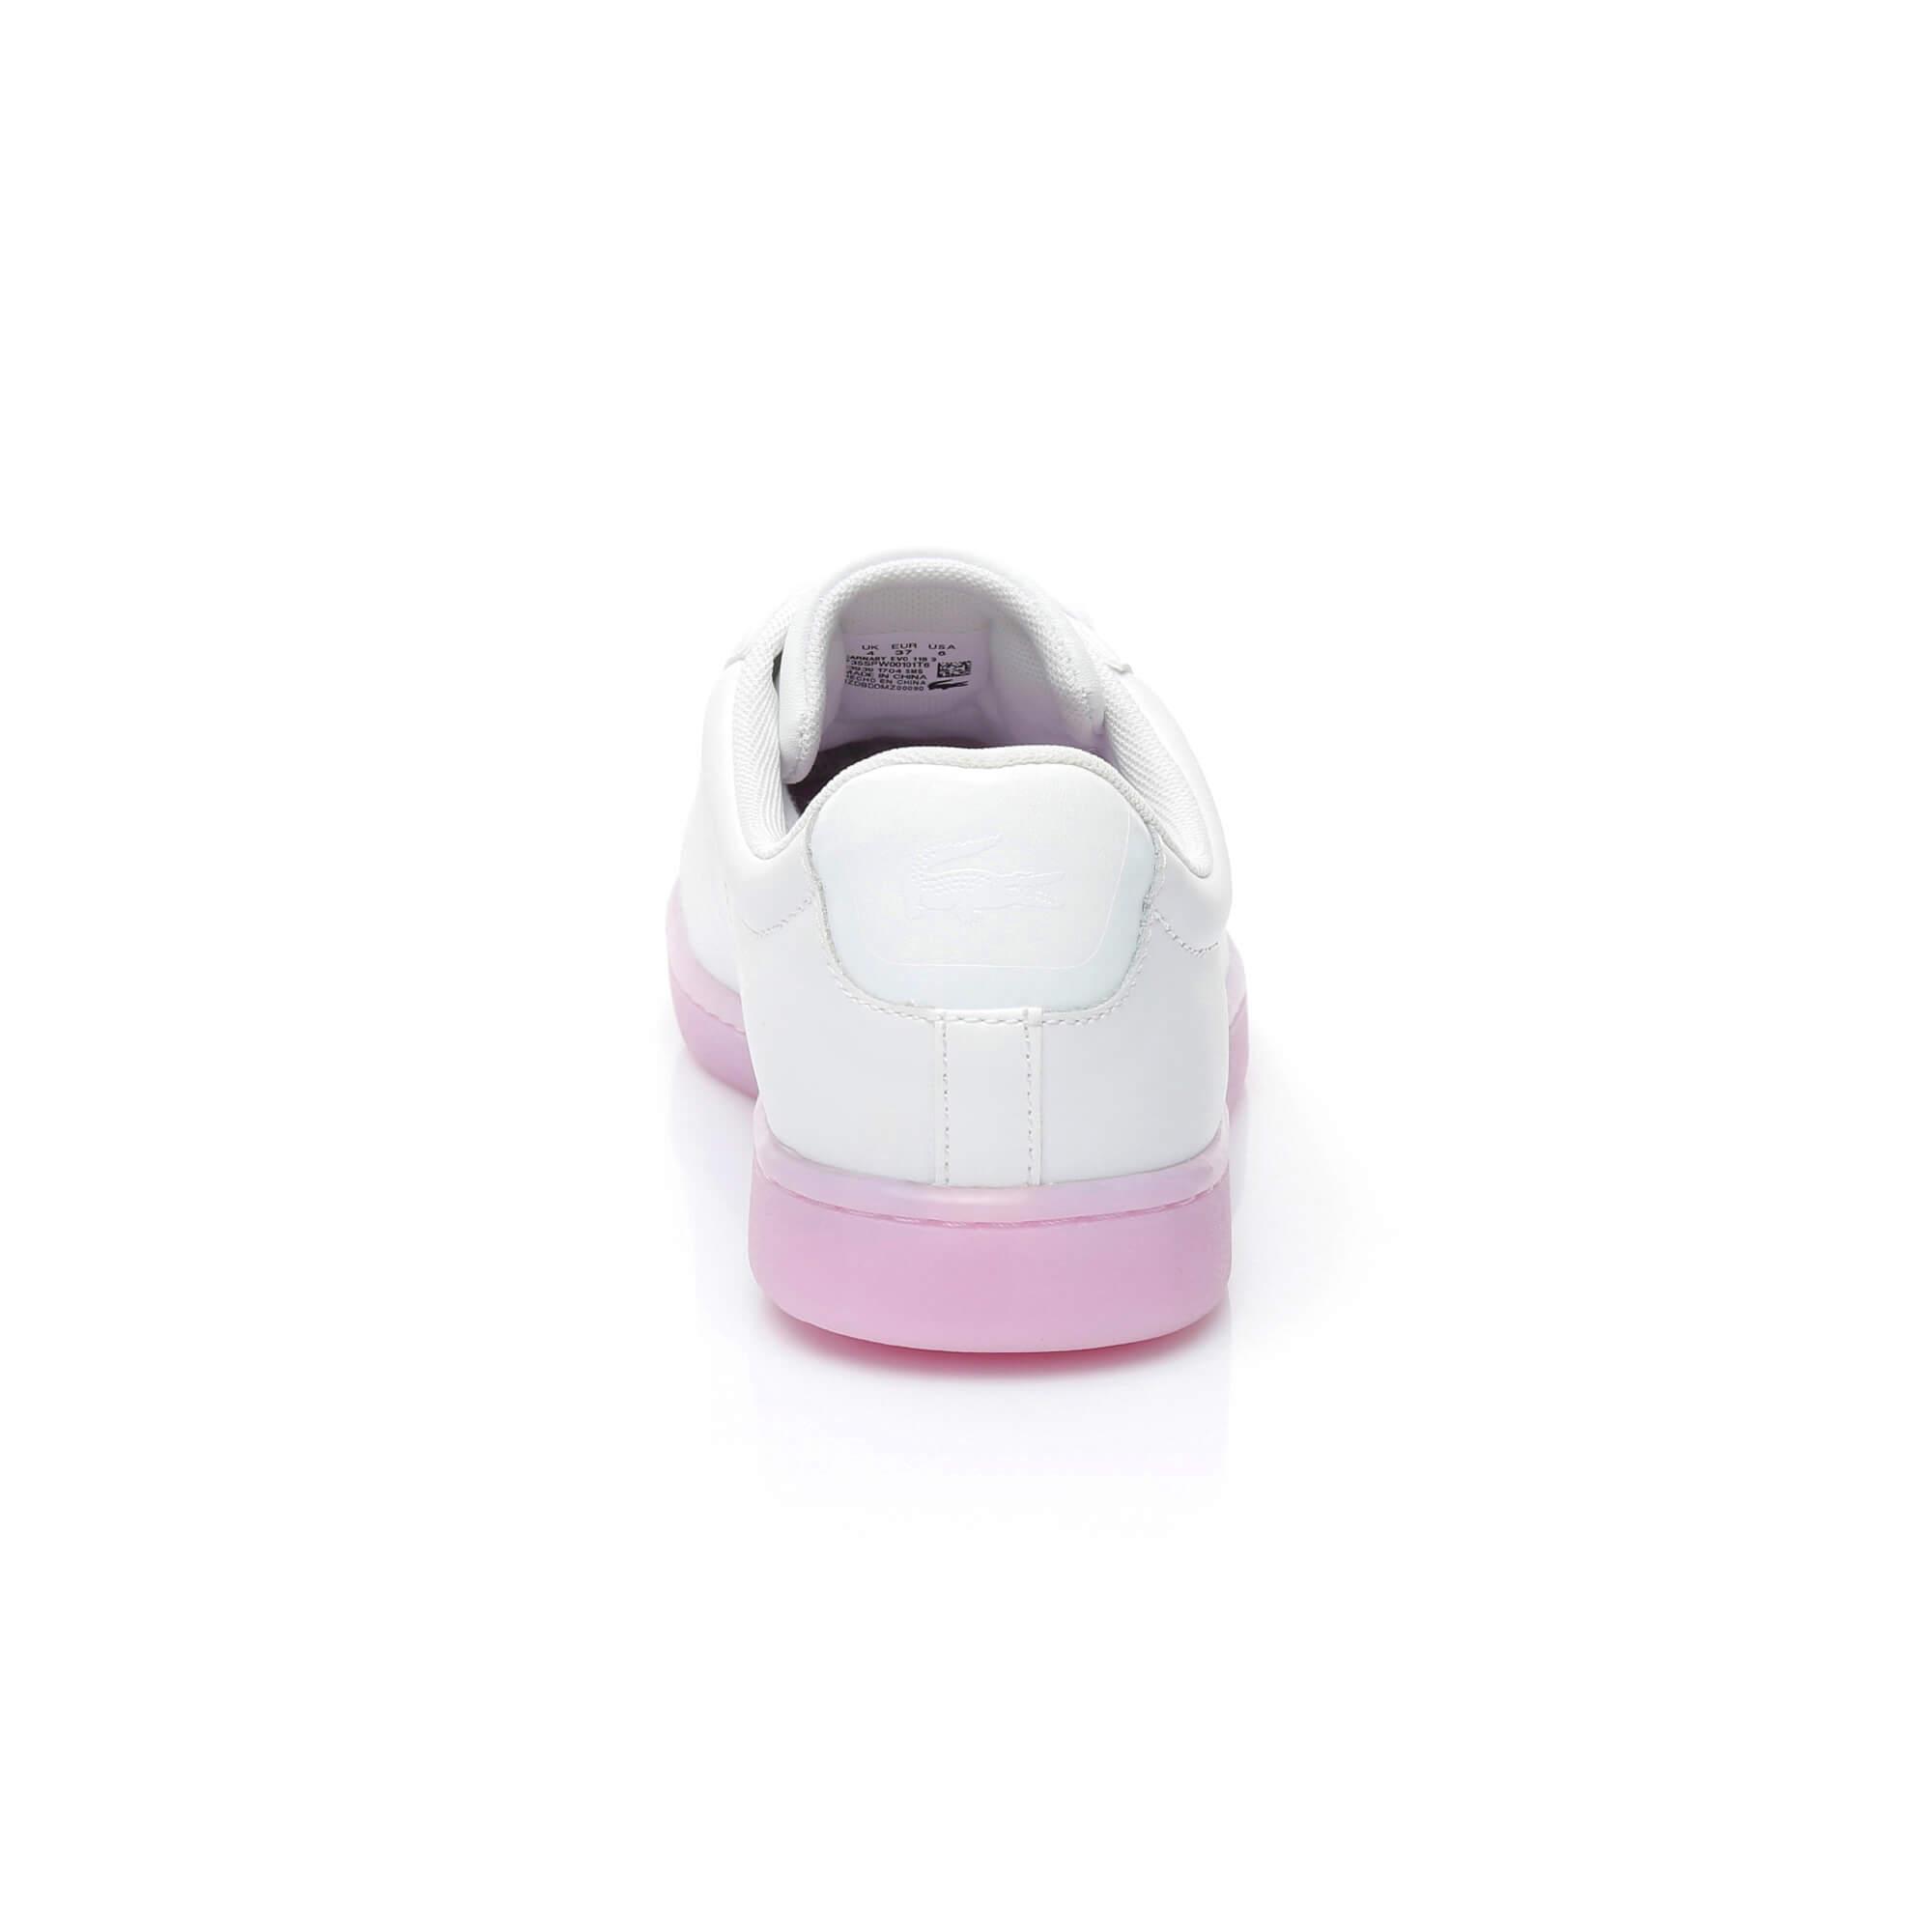 Lacoste Carnaby Evo 118 3 Damskie Sneakersy